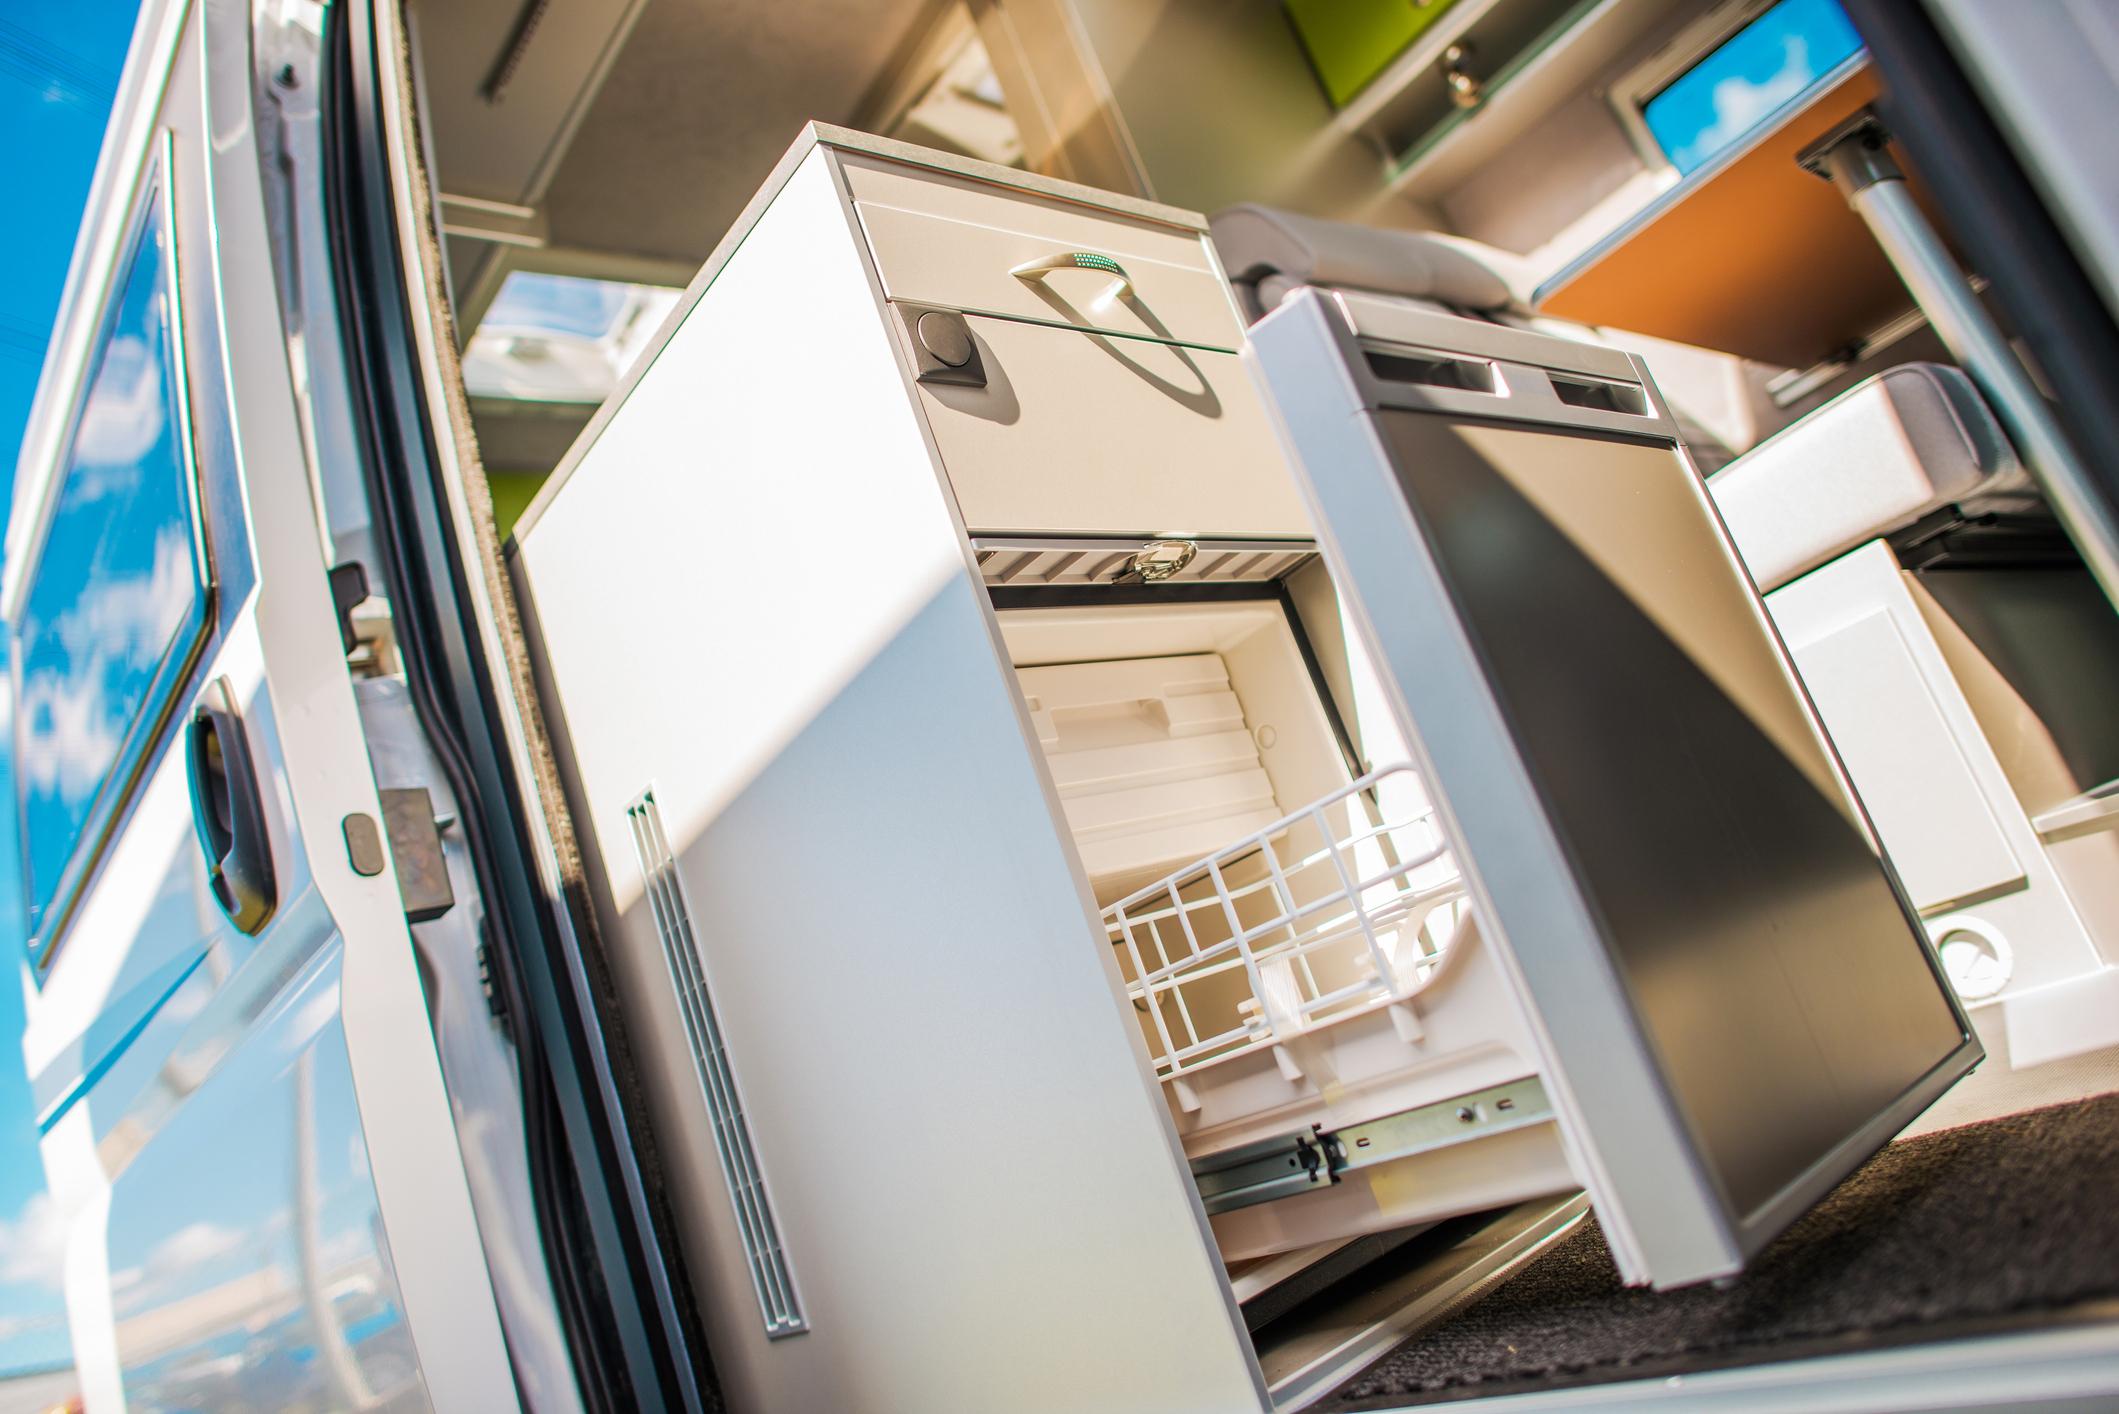 Modern Camper Van 12V Refrigerator